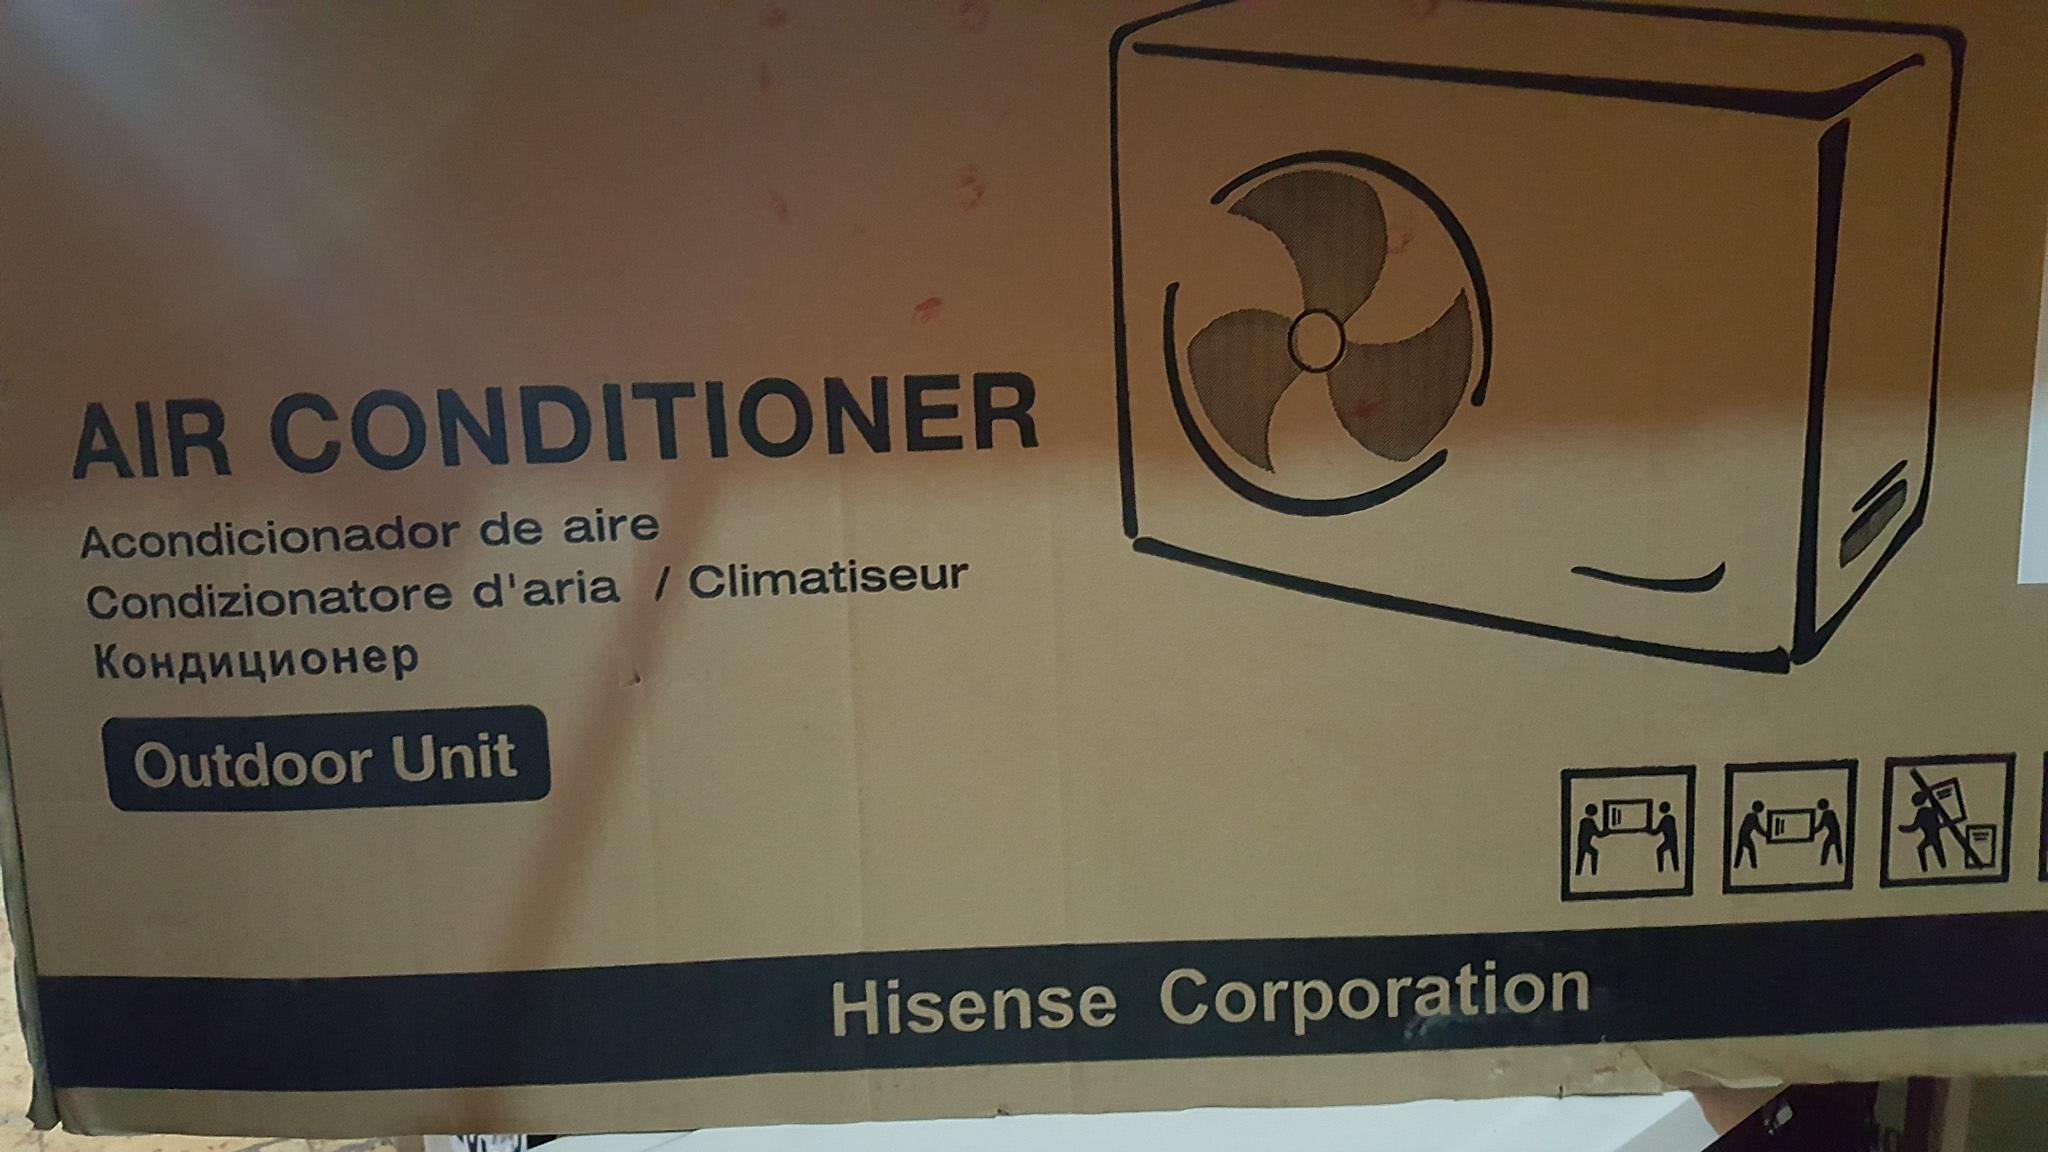 Bodega Aurrerá: minisplit hisense 12000 btu y clima de ventana LG en líquidacion